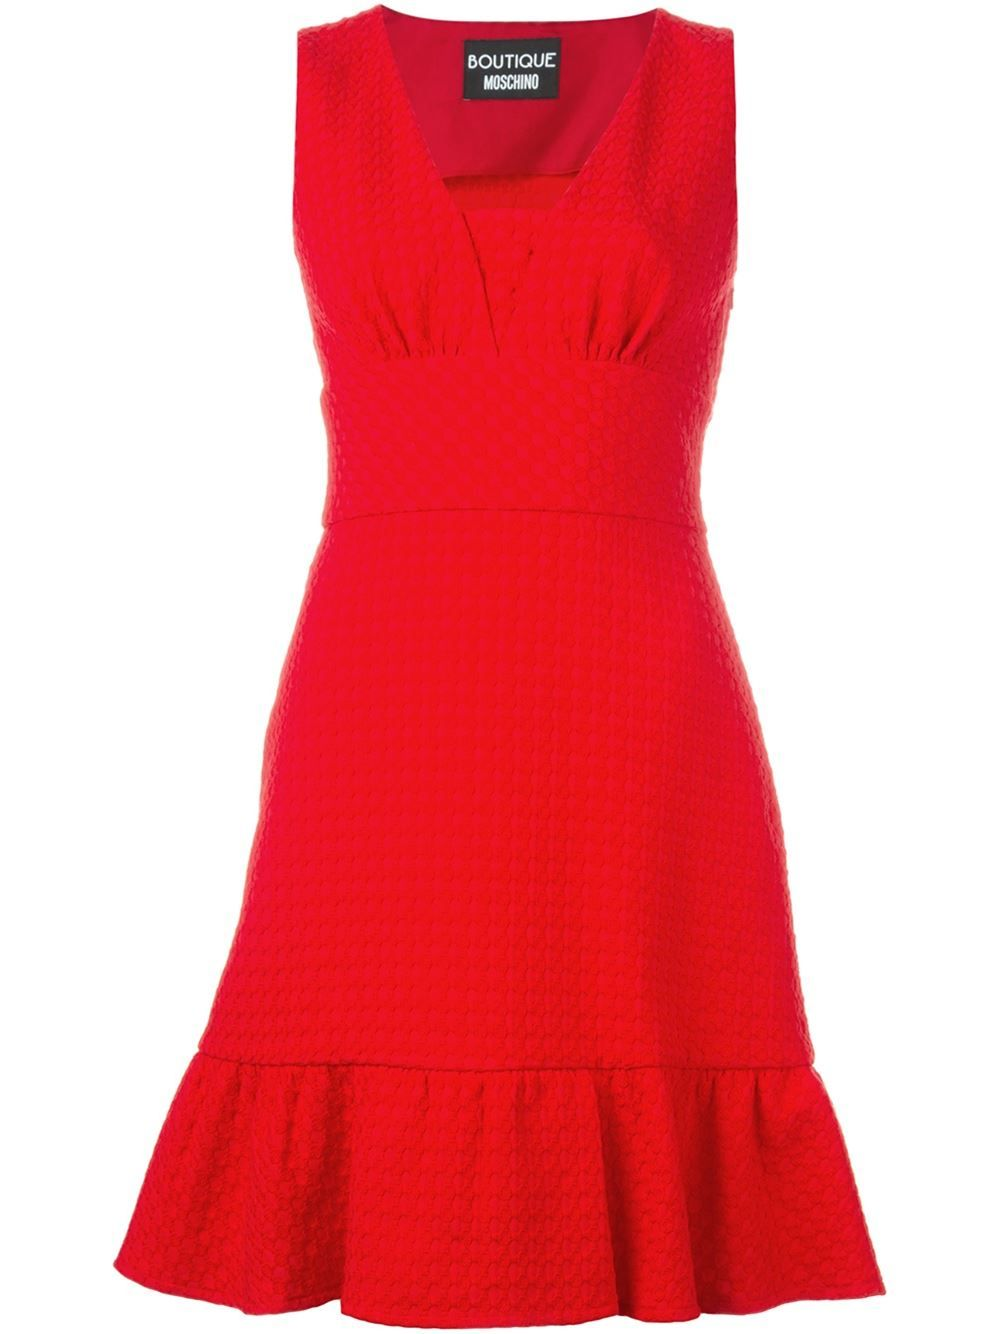 Boutique Moschino flared hem sleeveless dress